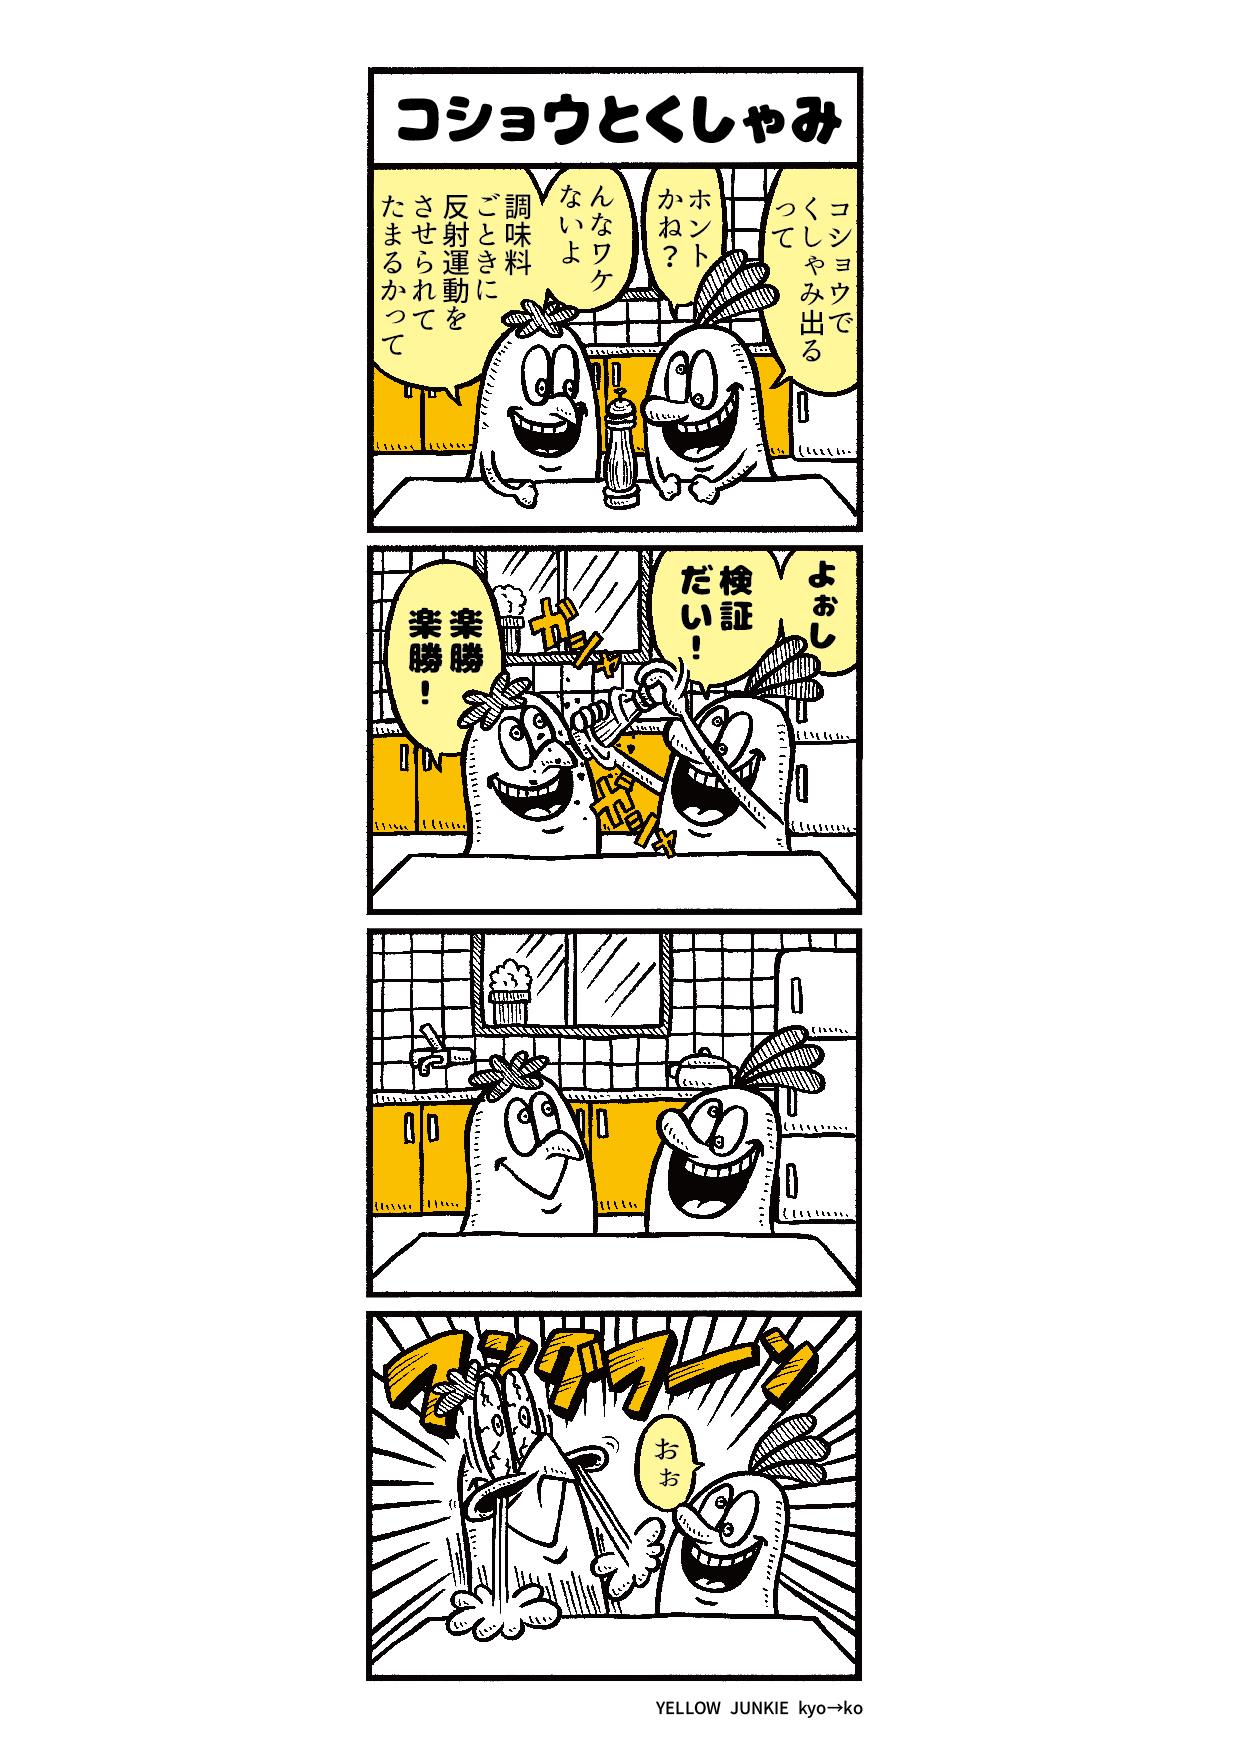 YELLOW JUNKIE「21話:コショウとくしゃみ」